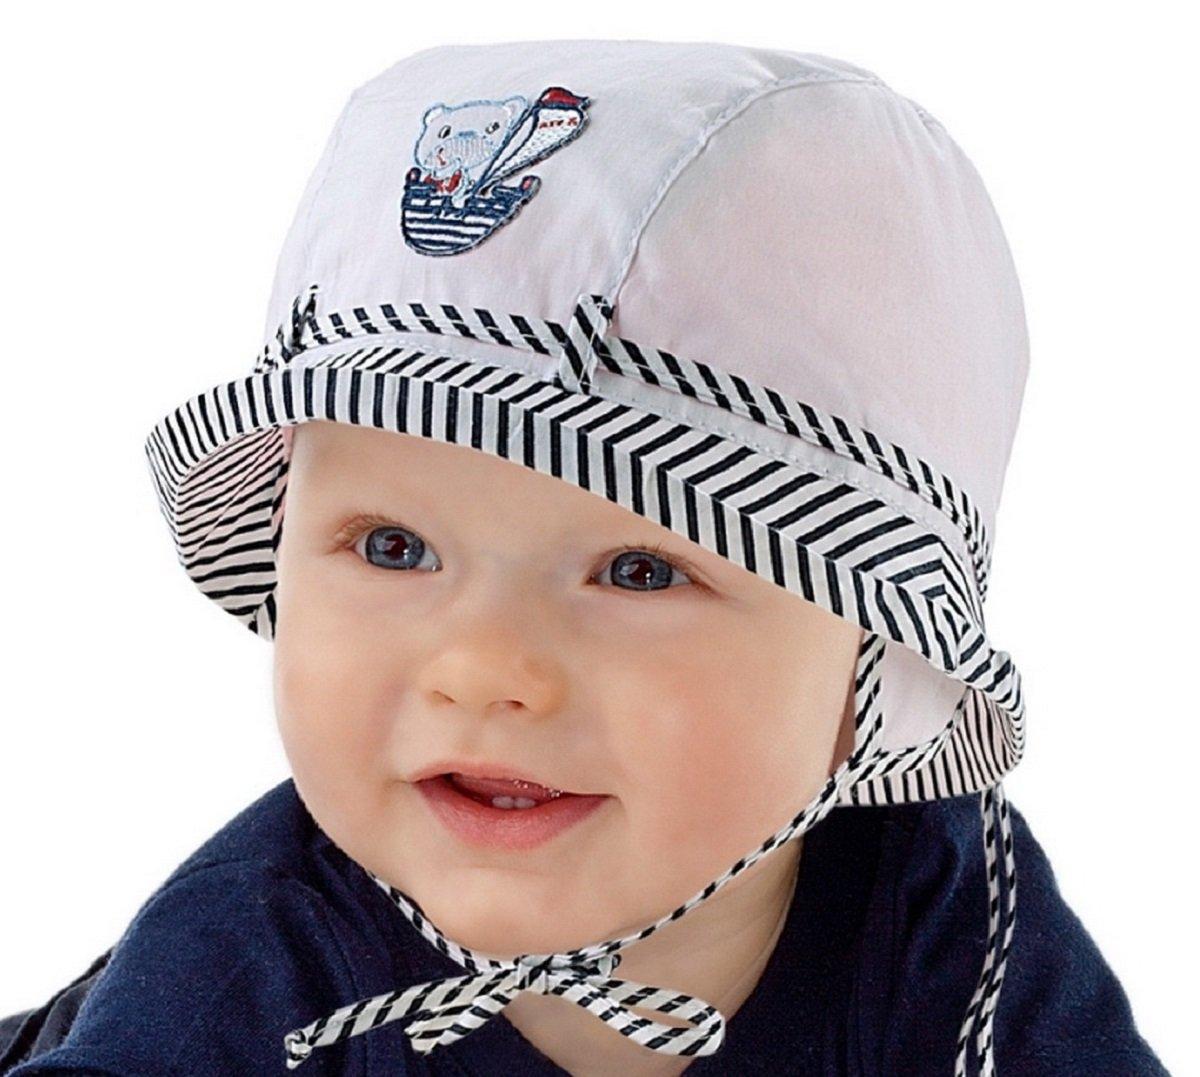 Boys Sun Hat Holiday Beach Summer Baby Boy Hat 6 9 12 18 24 months 2-3  years Marine Collection NEW (2-3 years 52cm b4551cbb68f